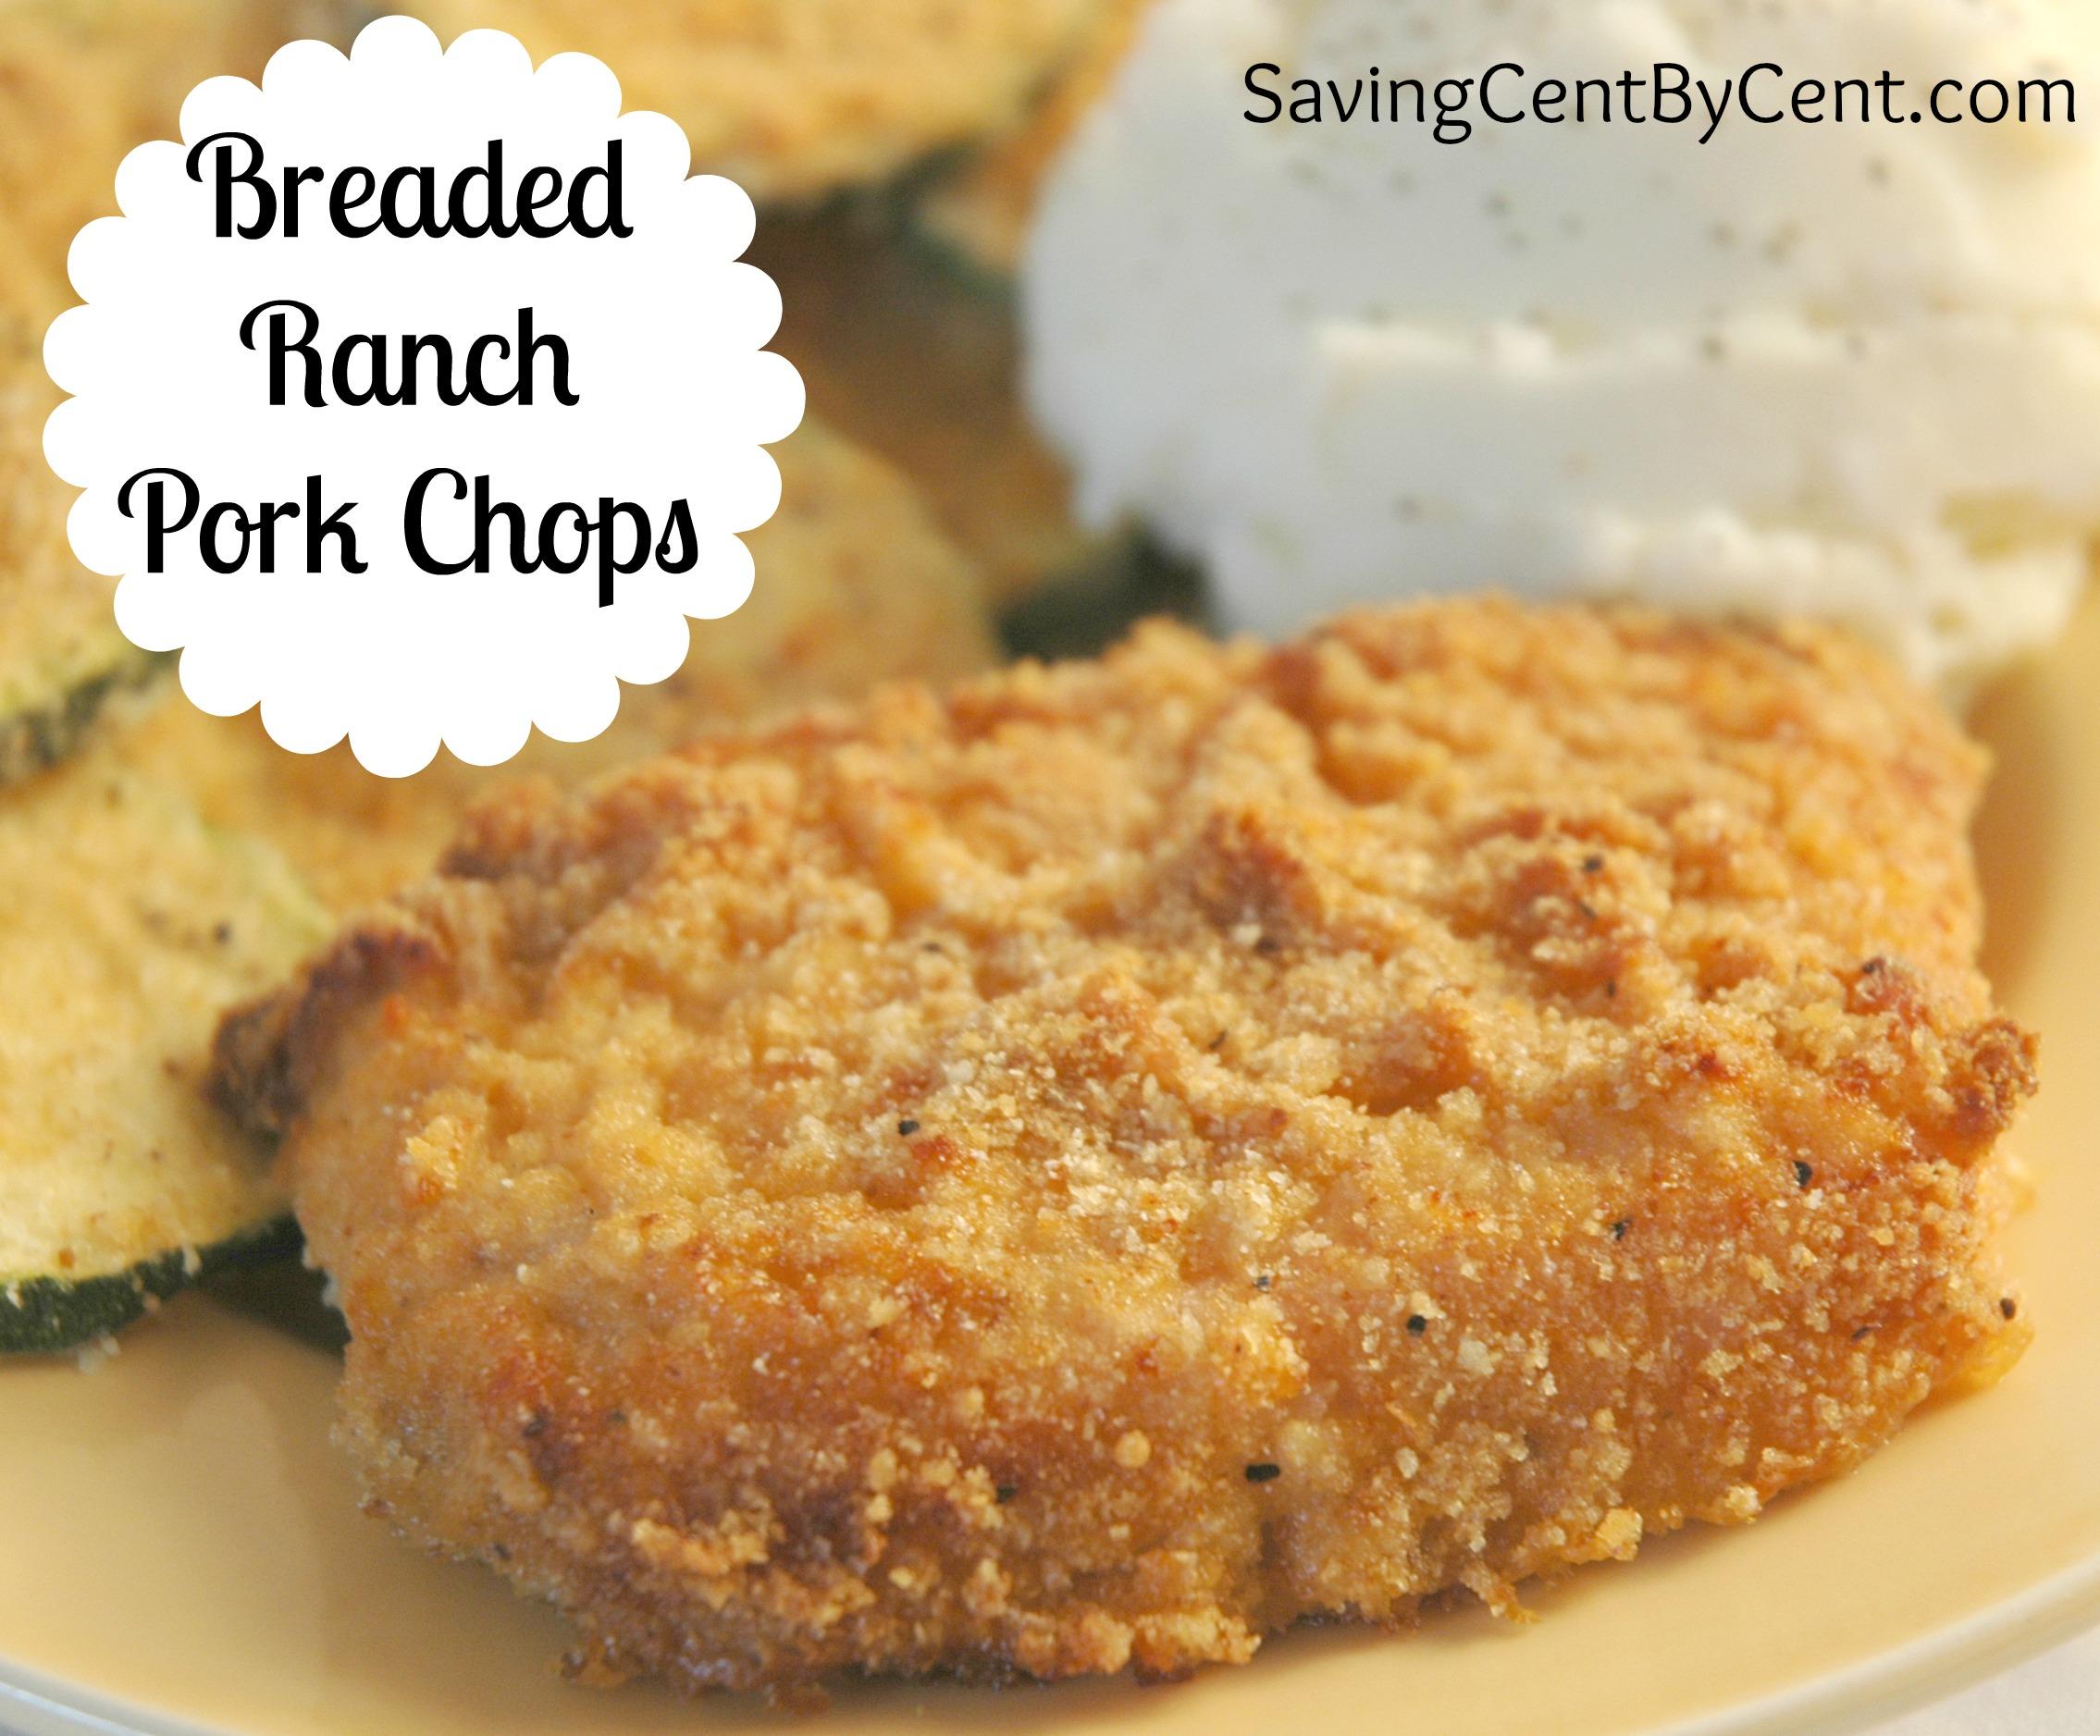 breaded ranch pork chop recipe Breaded Ranch Pork Chops